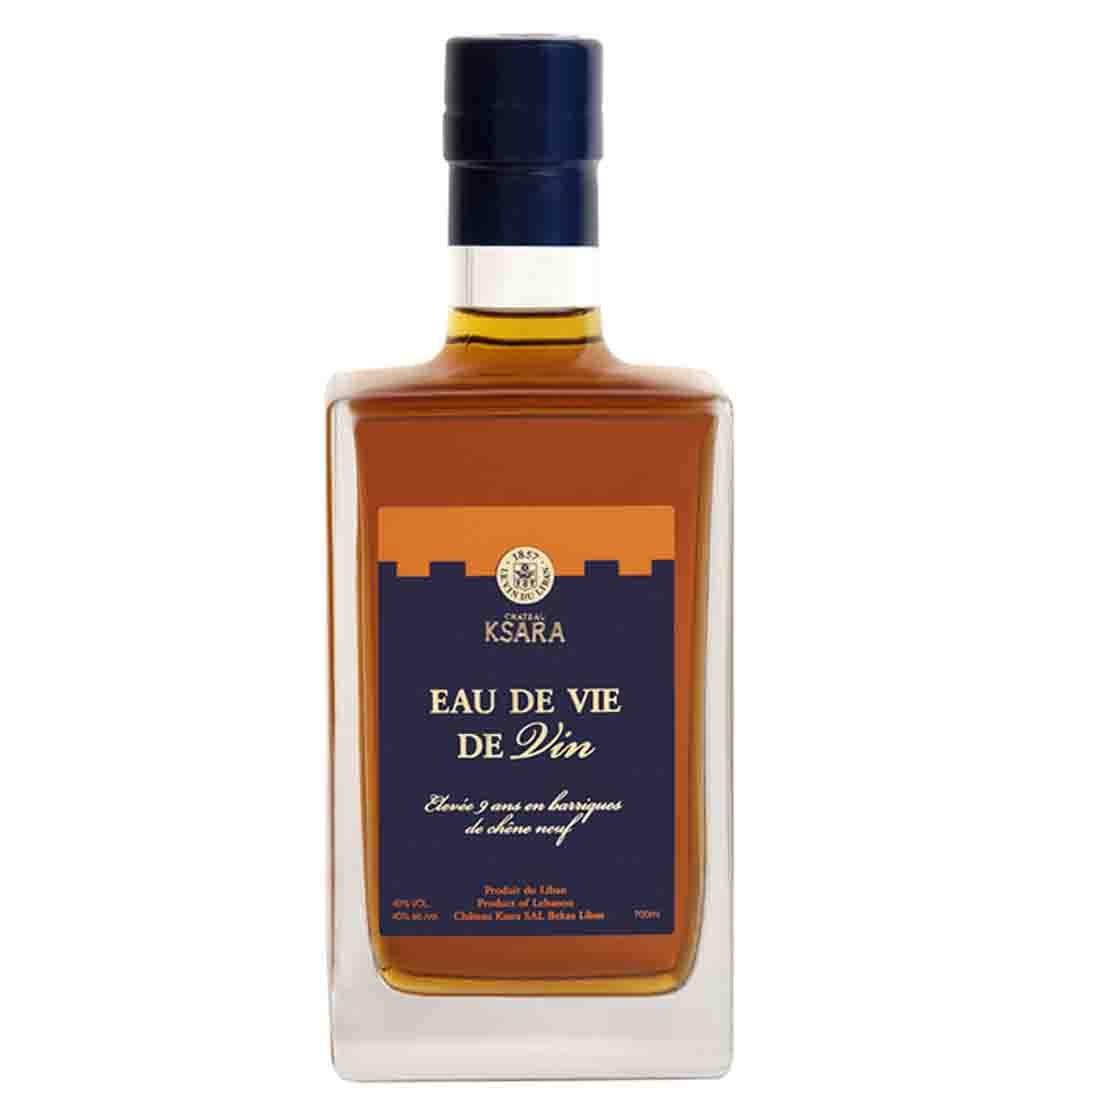 Chateau ksara eau de vie de vin distilled spirit cognac brandy bekaa valley ugni blanc 9 years